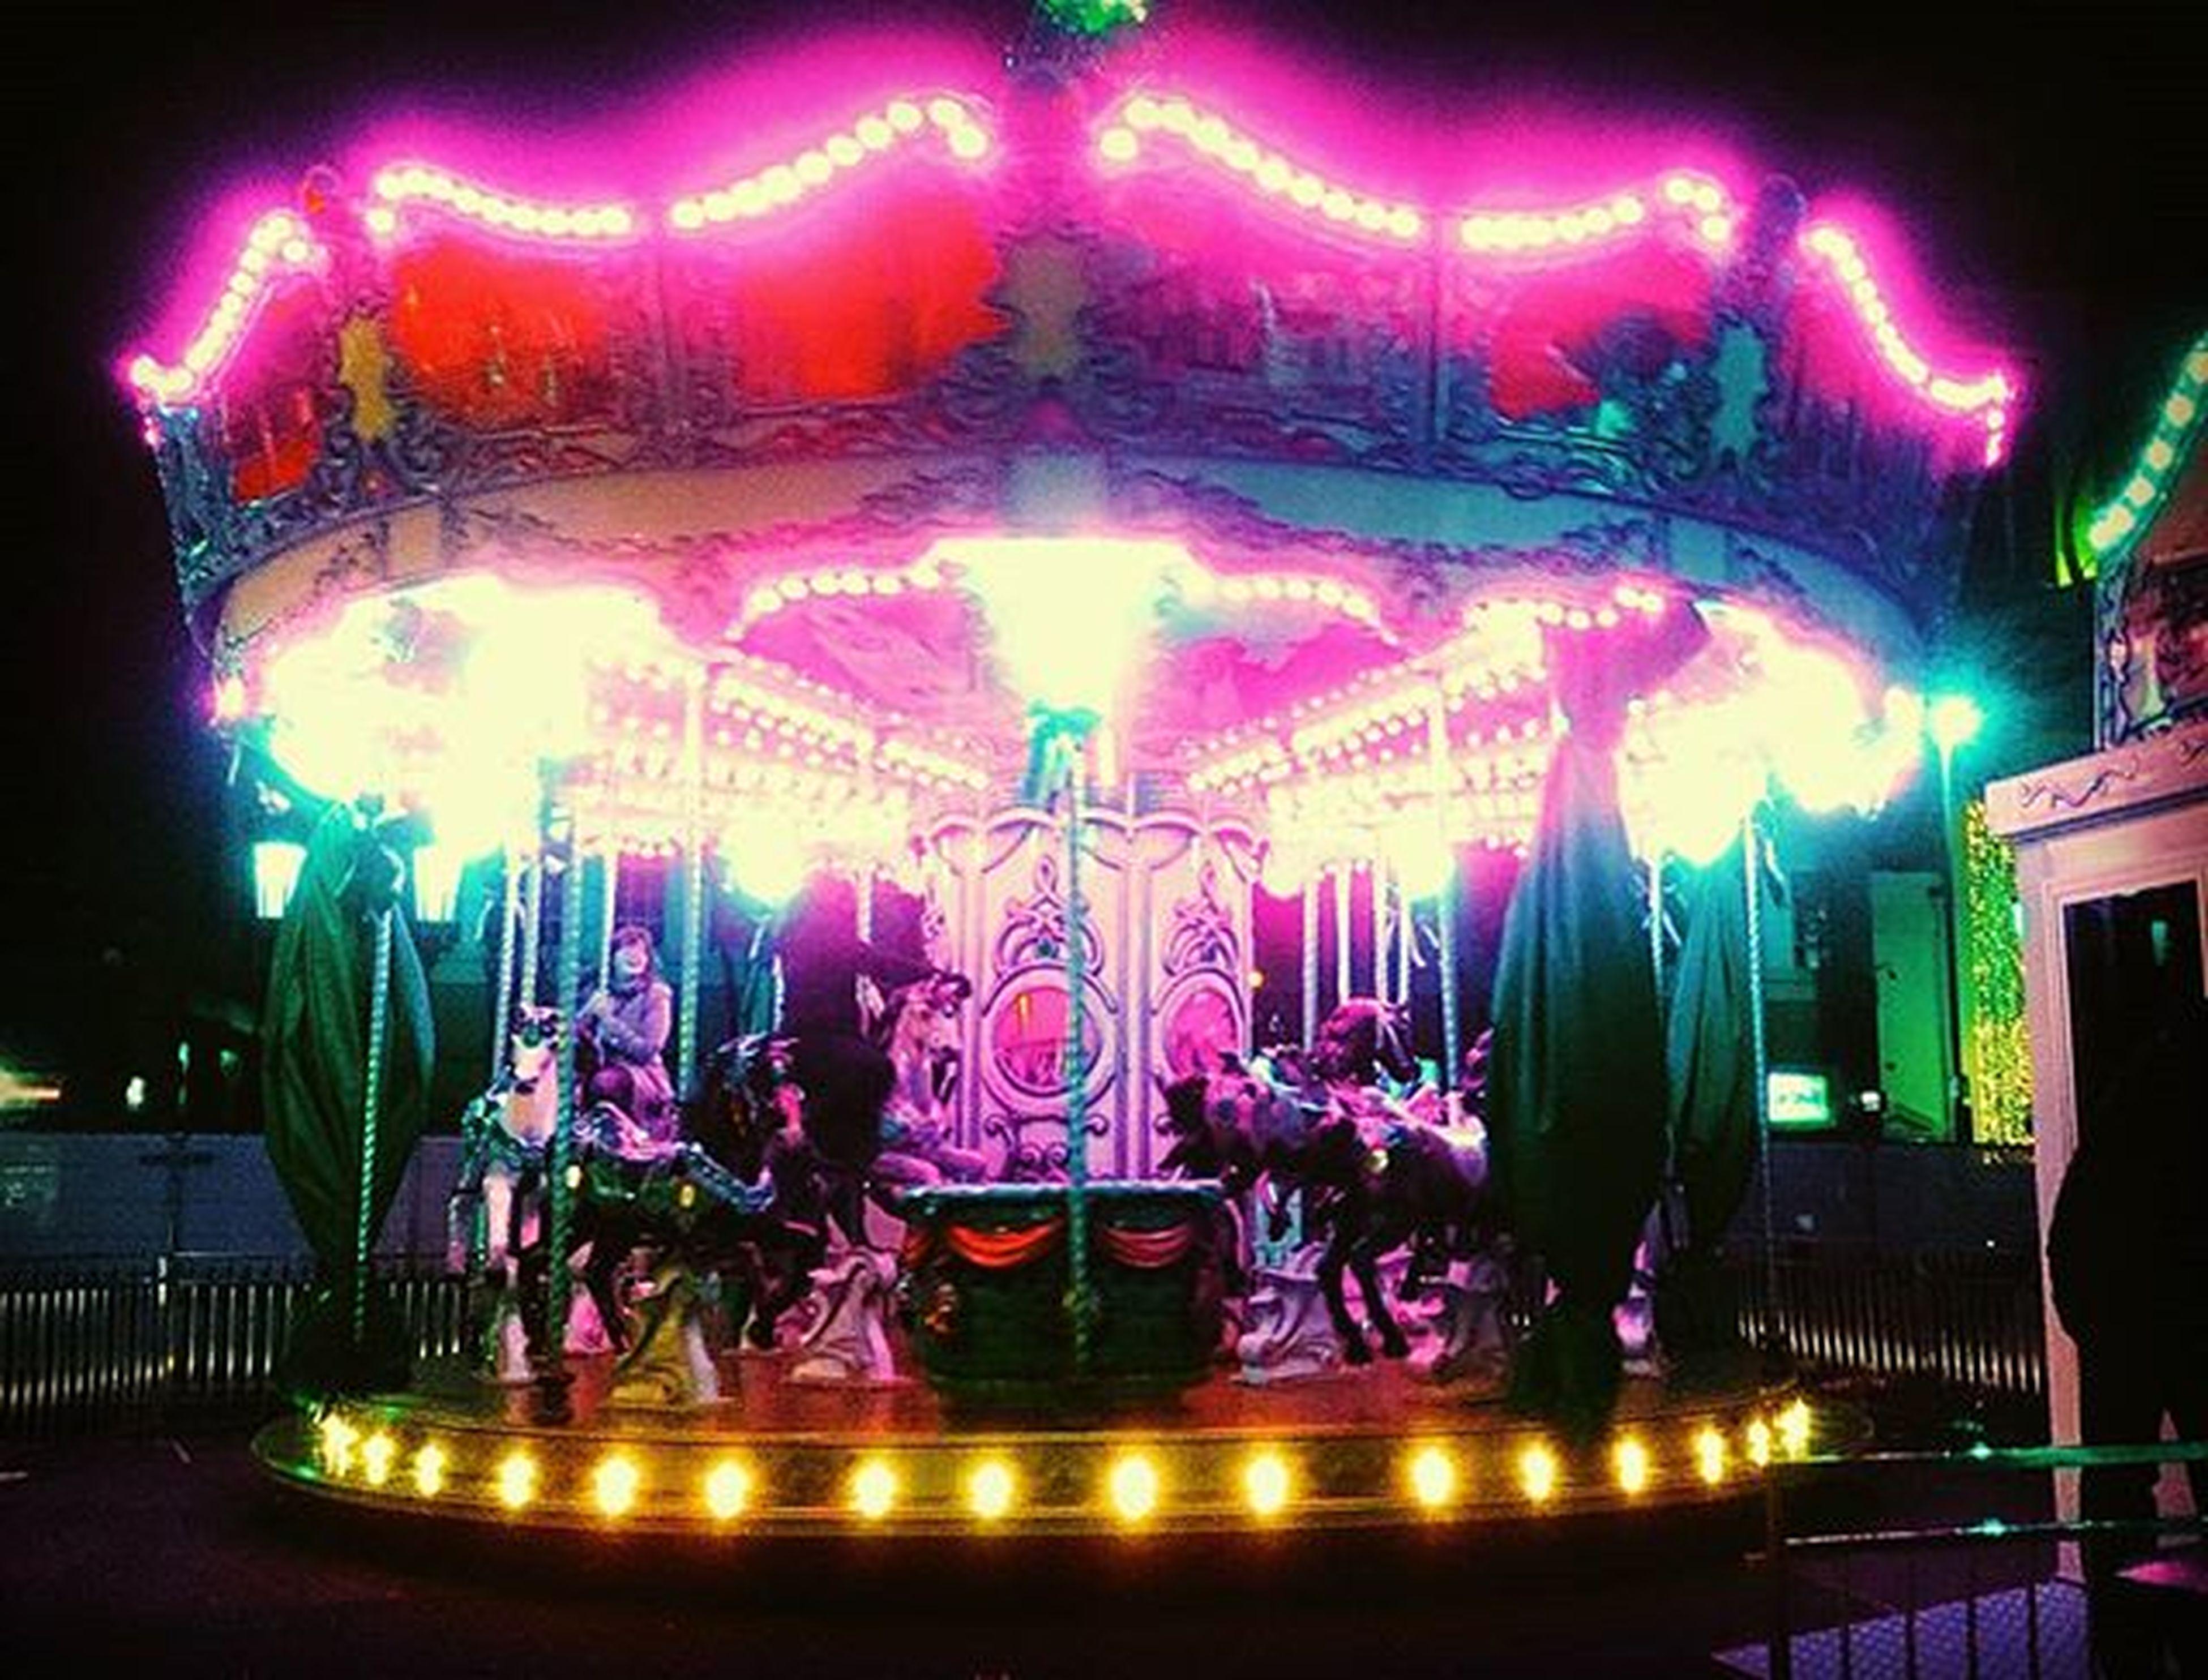 Carousel at the Belfast Continental Christmas Market :-) Carousel Christmas Belfast Belfastchristmasmarket Northernireland PureNorthernIreland Discovernorthernireland Horse Fun Funfair Lights Colour Night Market Christmasmarkets Icuireland Ireland Pretty Christmastime Festival Fair Children City Citylights Festive